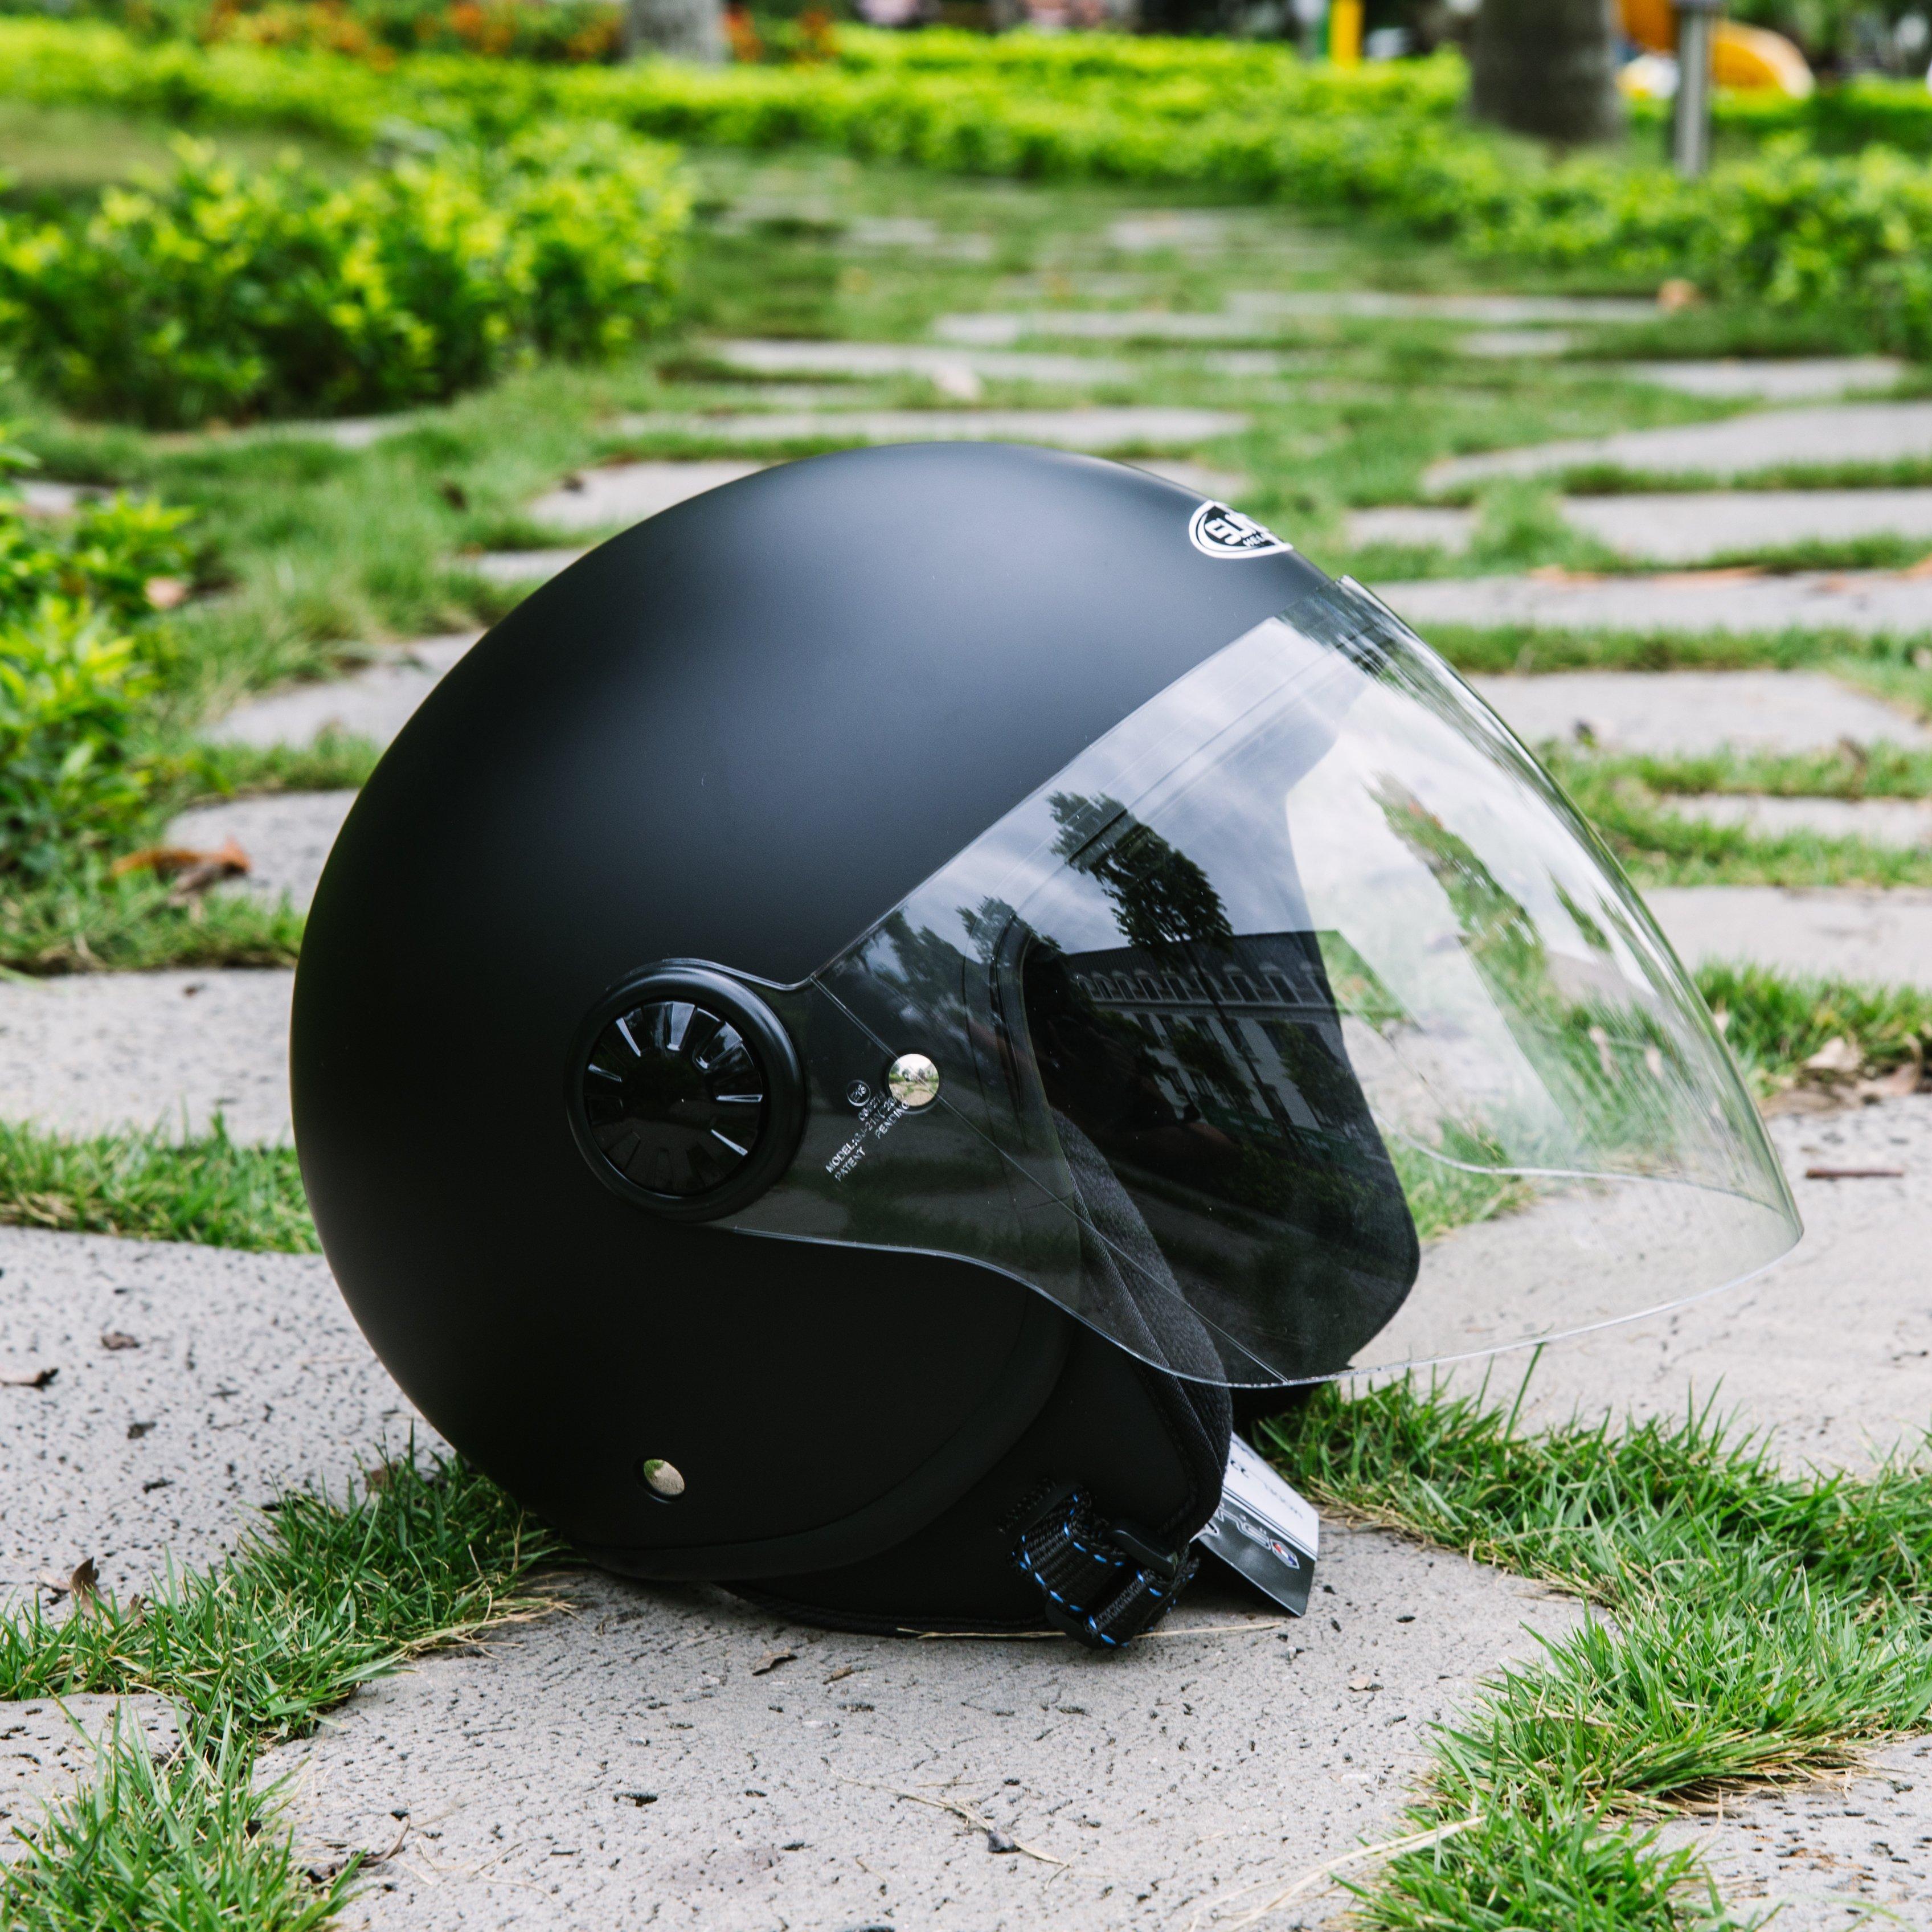 Mũ bảo hiểm 3/4 1 kính SUNDA 228